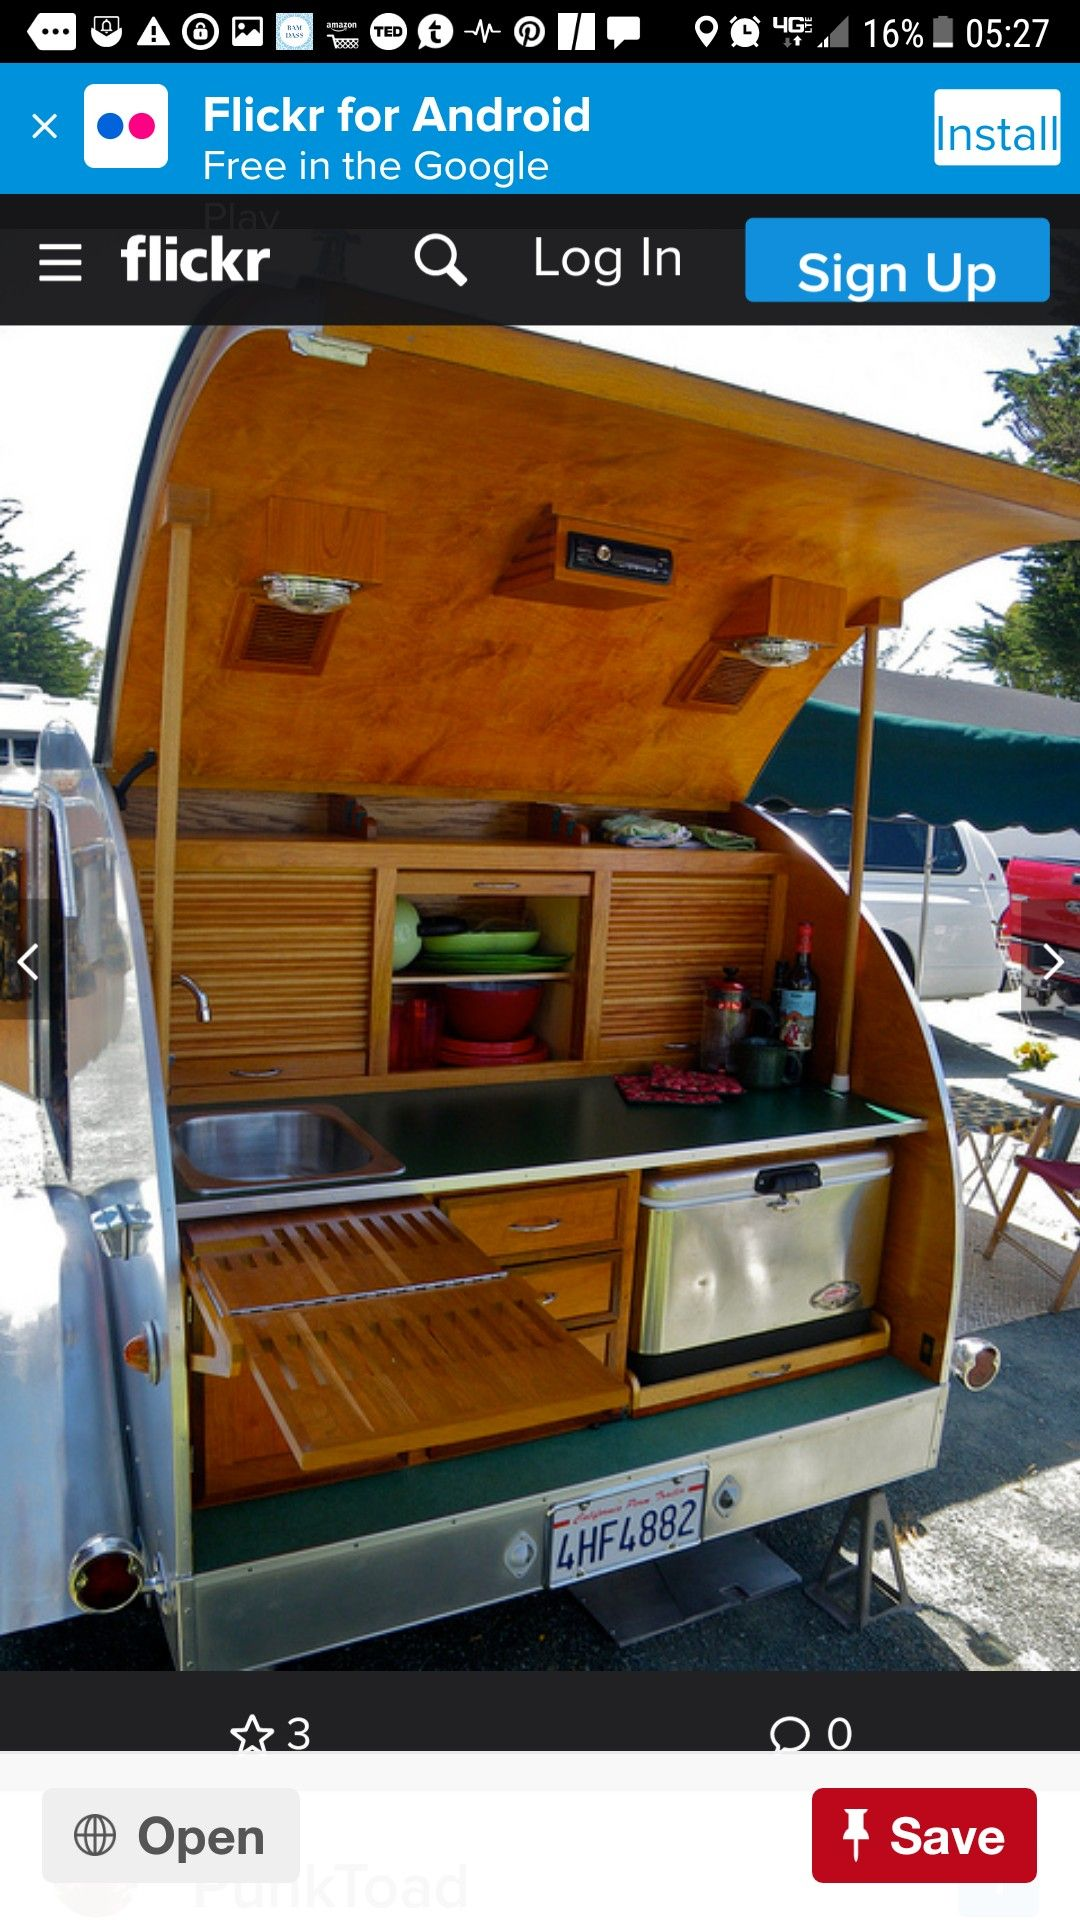 Pin de DangerFox en Project: Camping Trailer | Pinterest